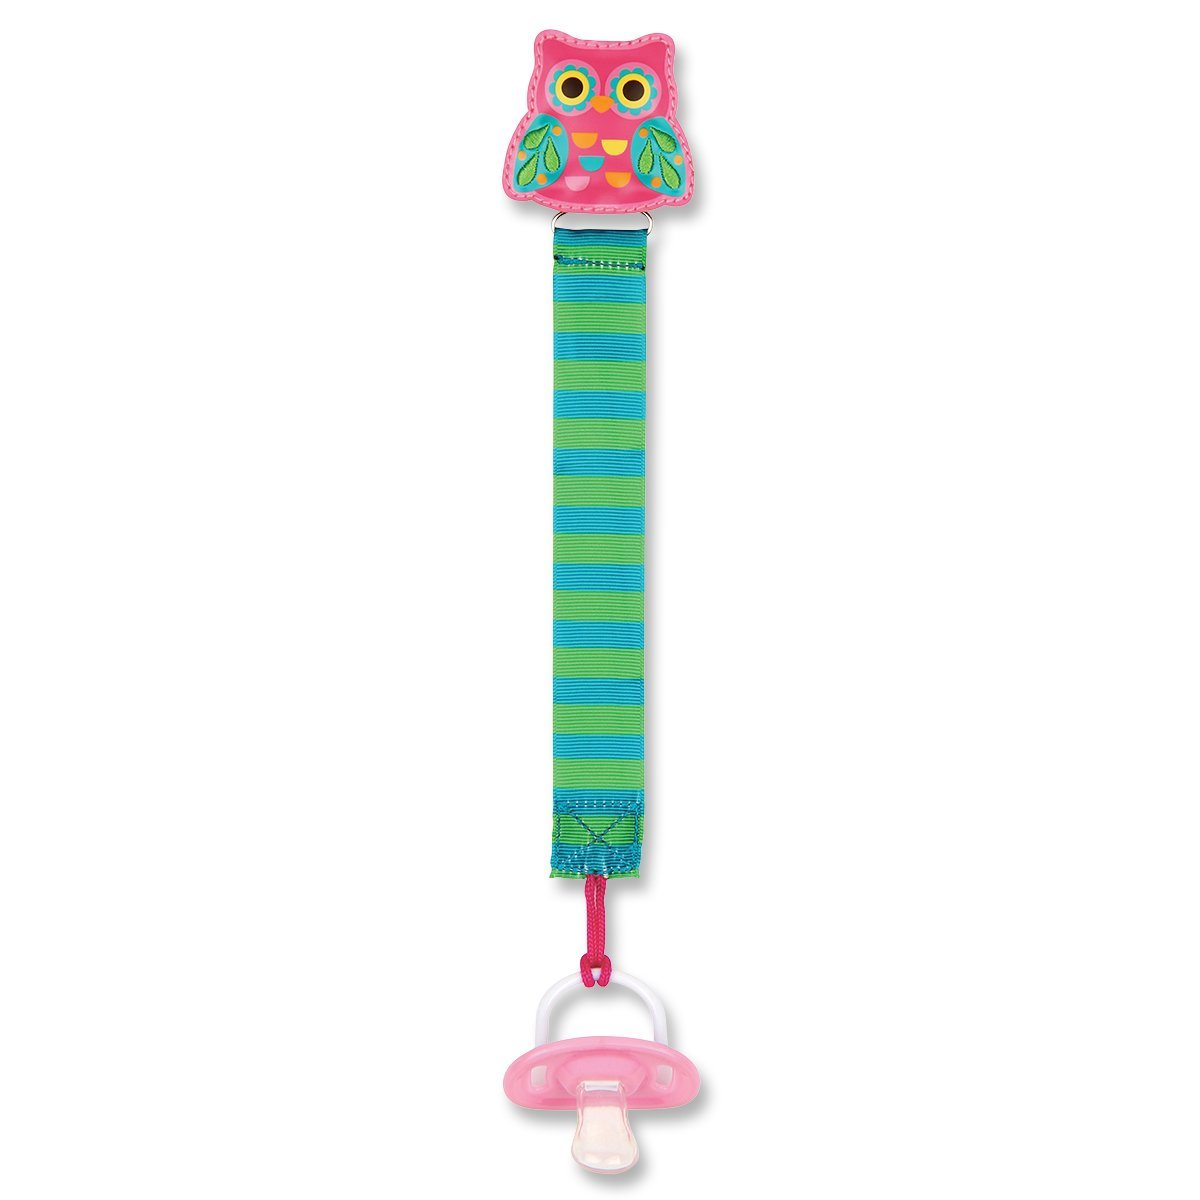 Amazon.com : Clip Chupete, Búho rosado : Baby